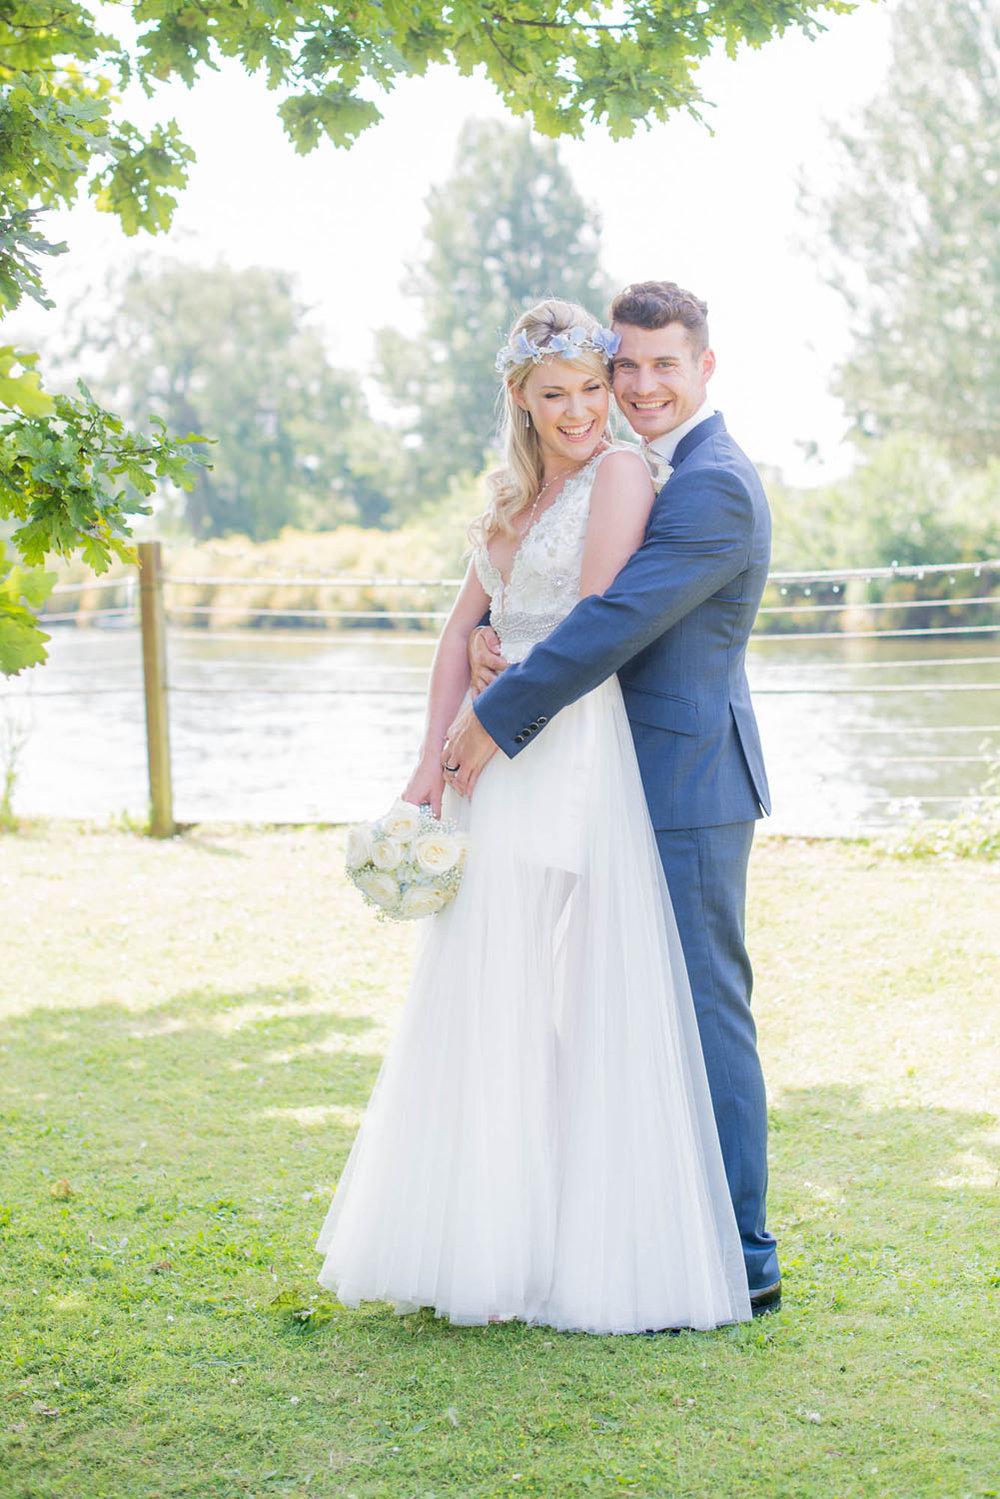 shropshire-wedding-photographer -7.jpg